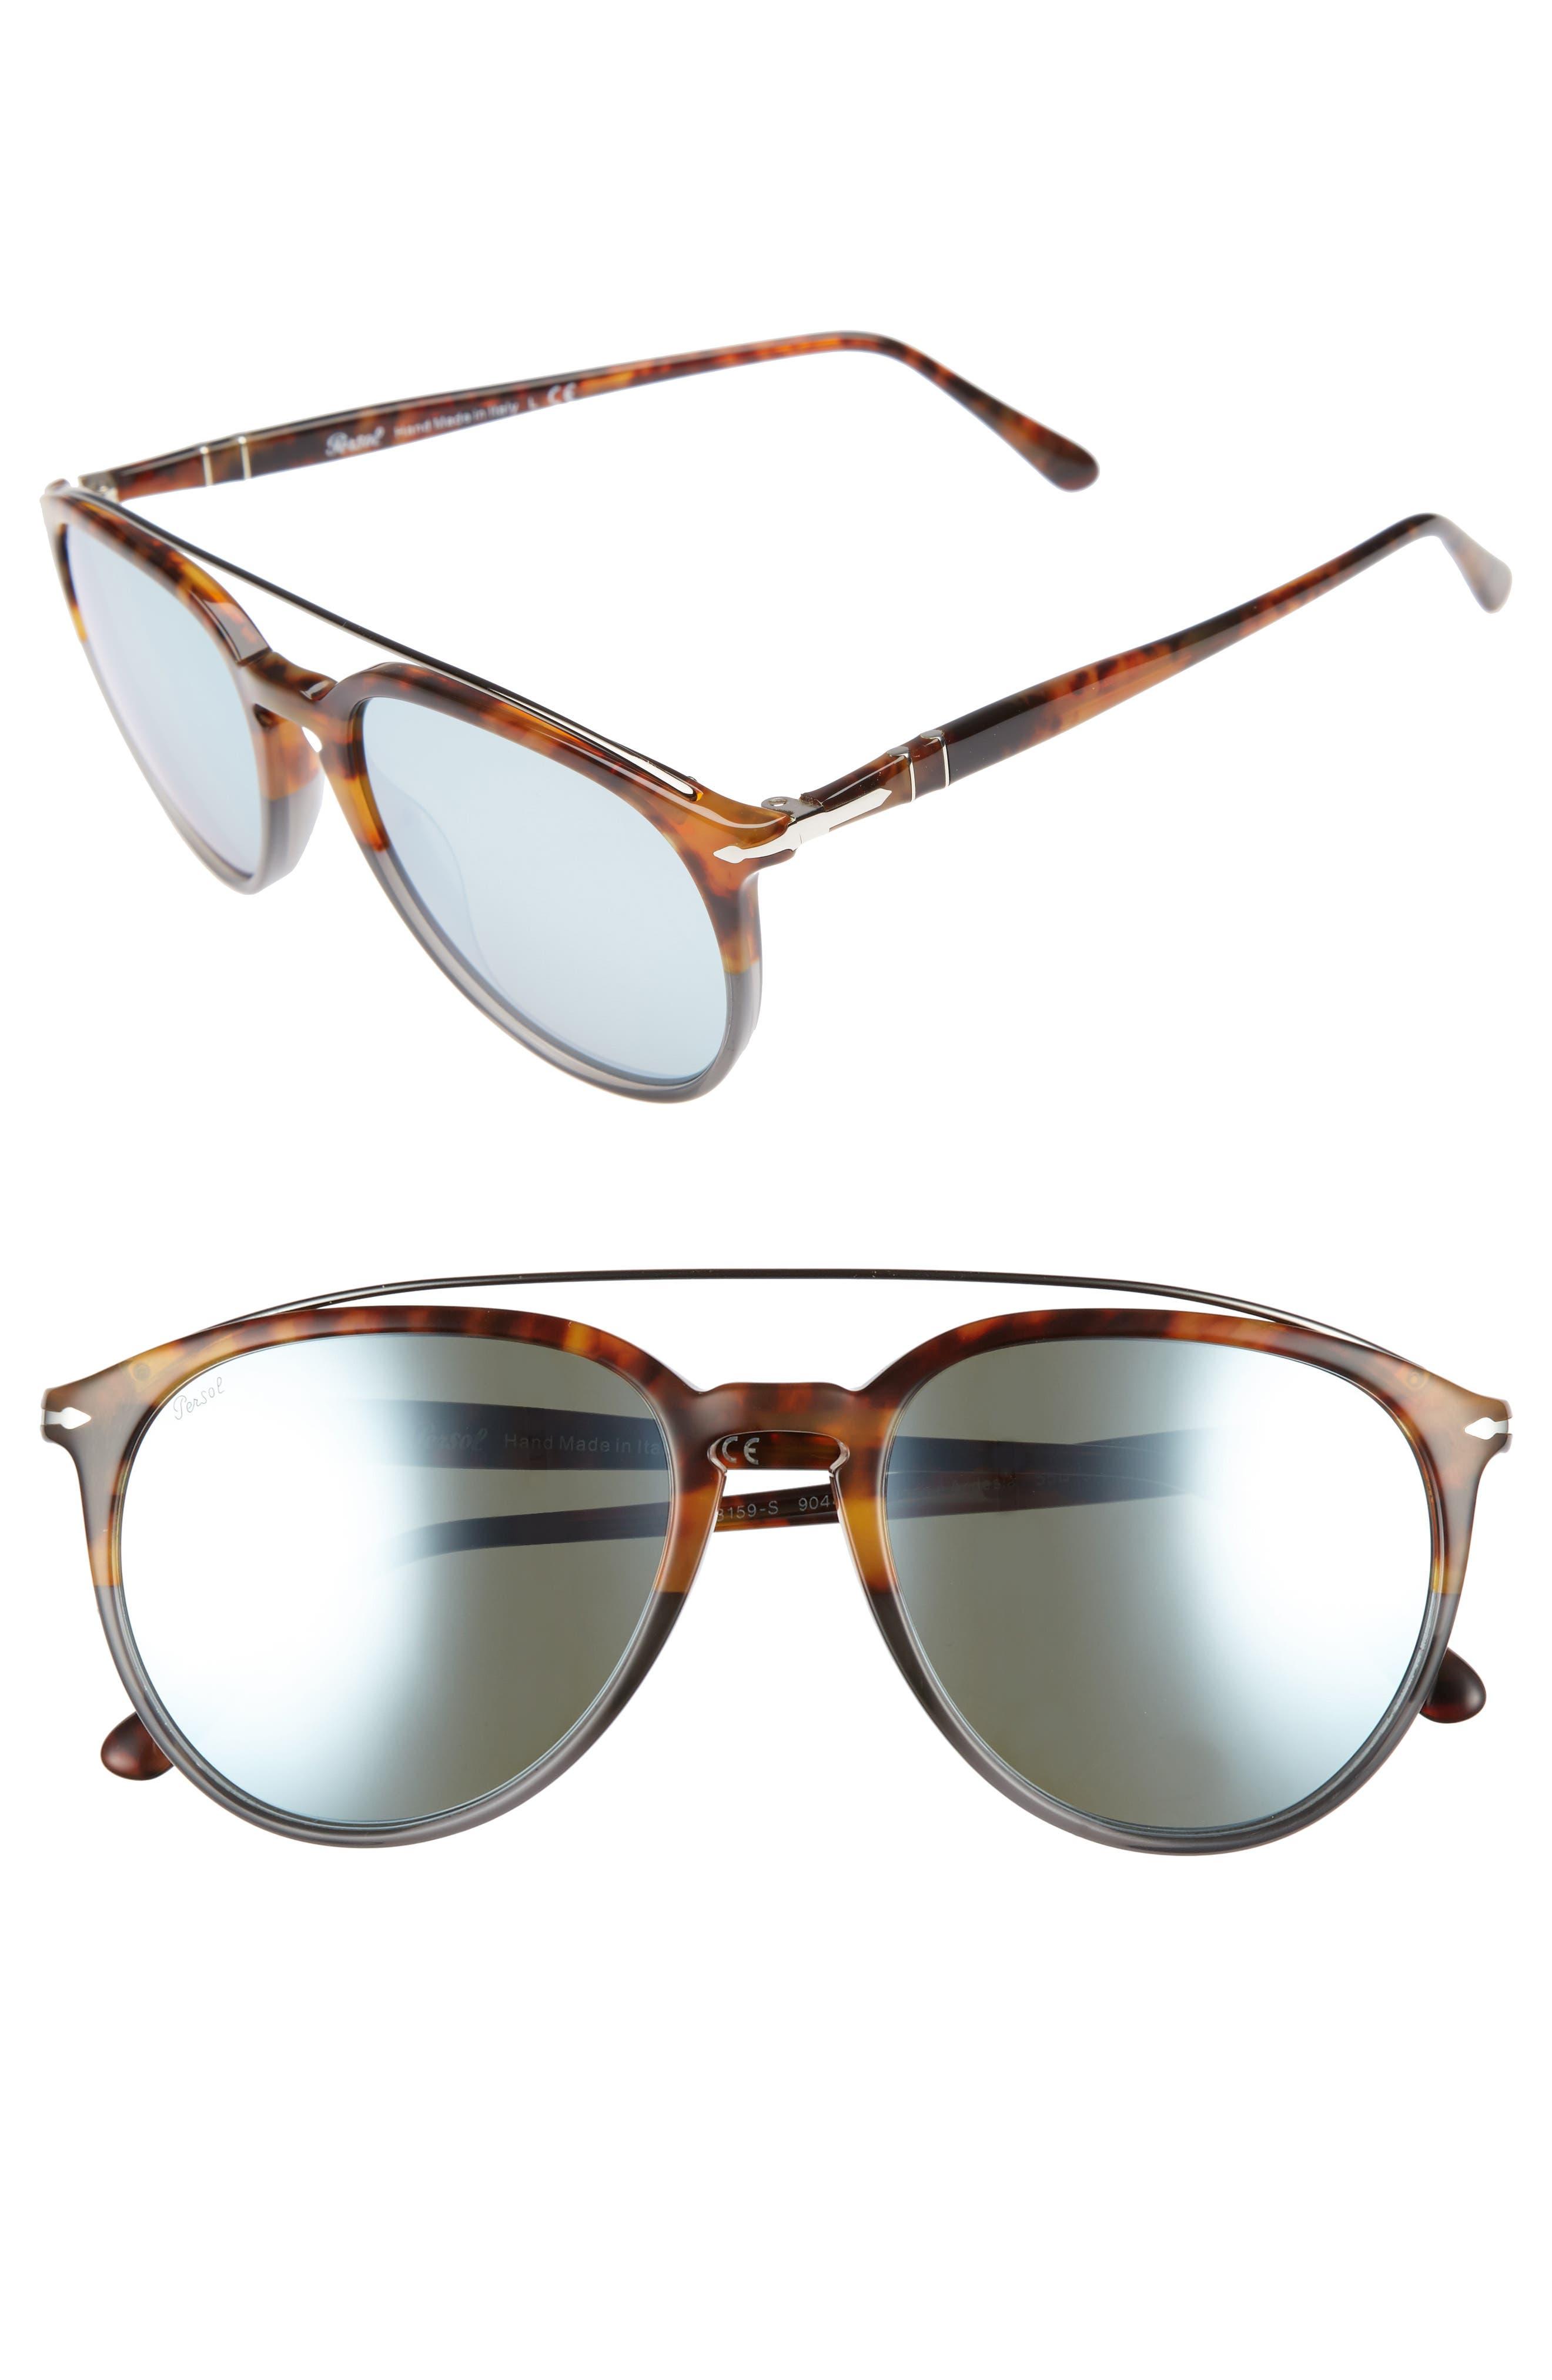 Sartoria 55mm Polarized Sunglasses,                             Main thumbnail 1, color,                             205